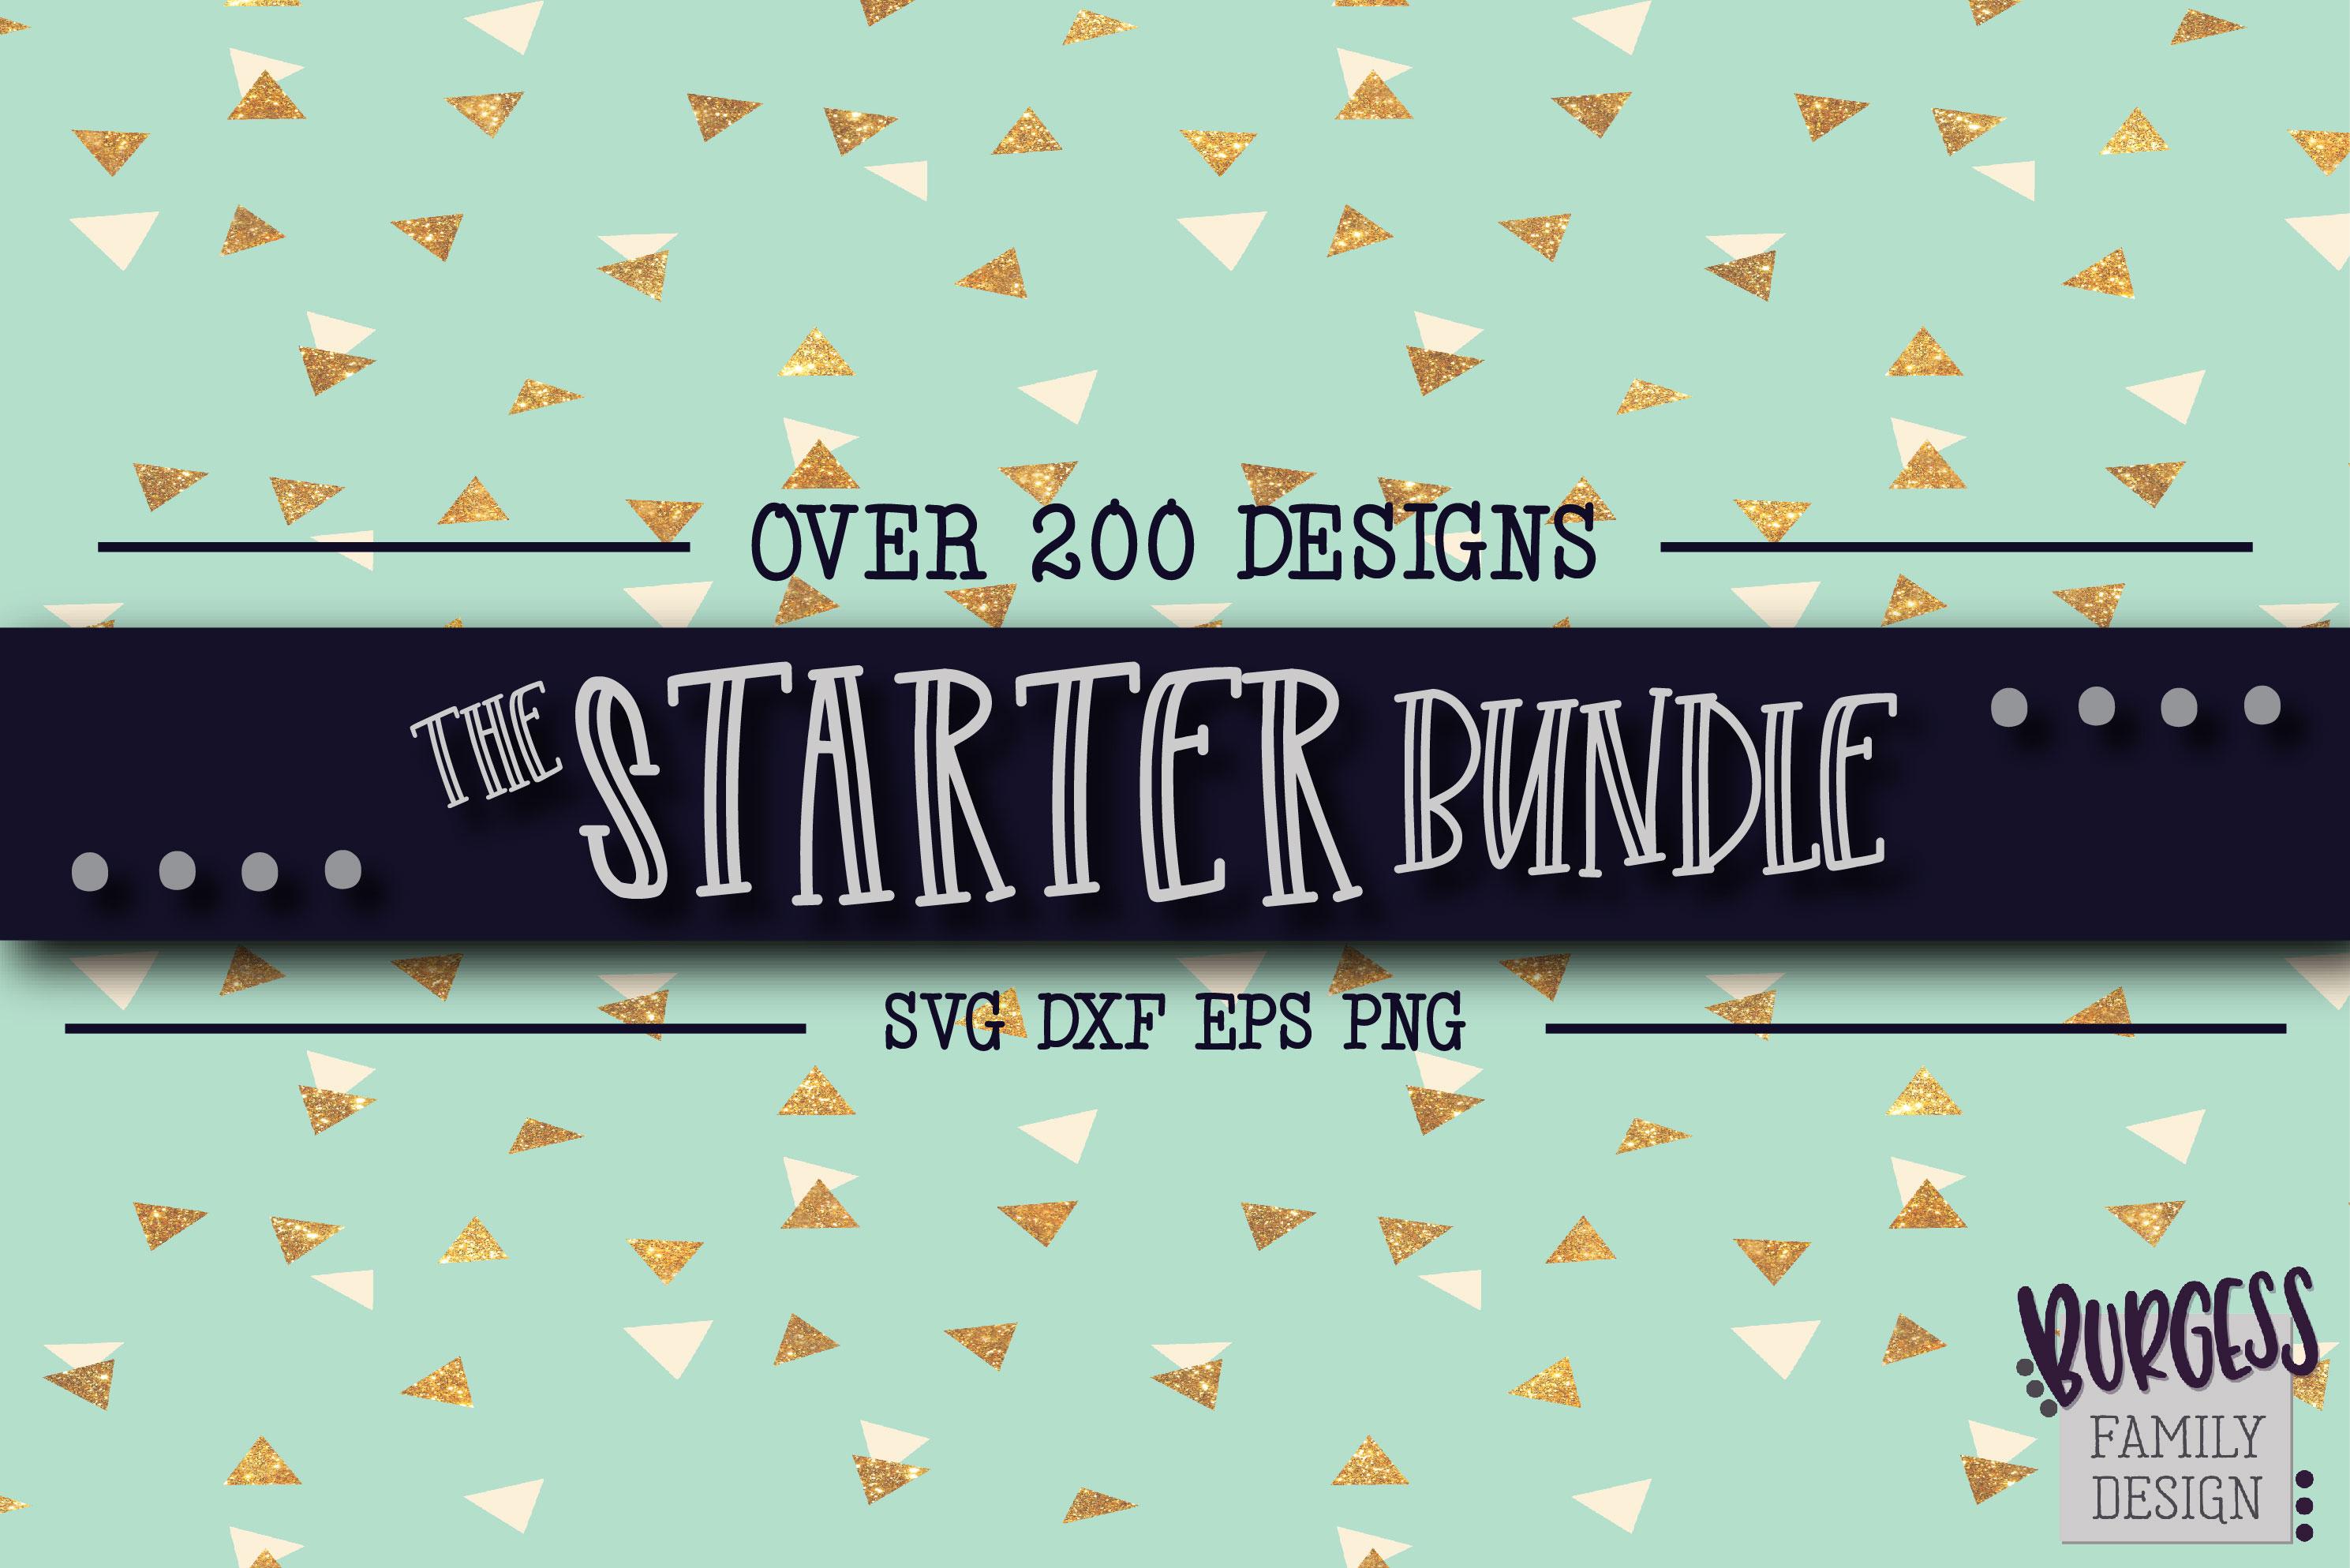 The starter bundle - Over 200 Designs | SVG DXF EPS PNG example image 1